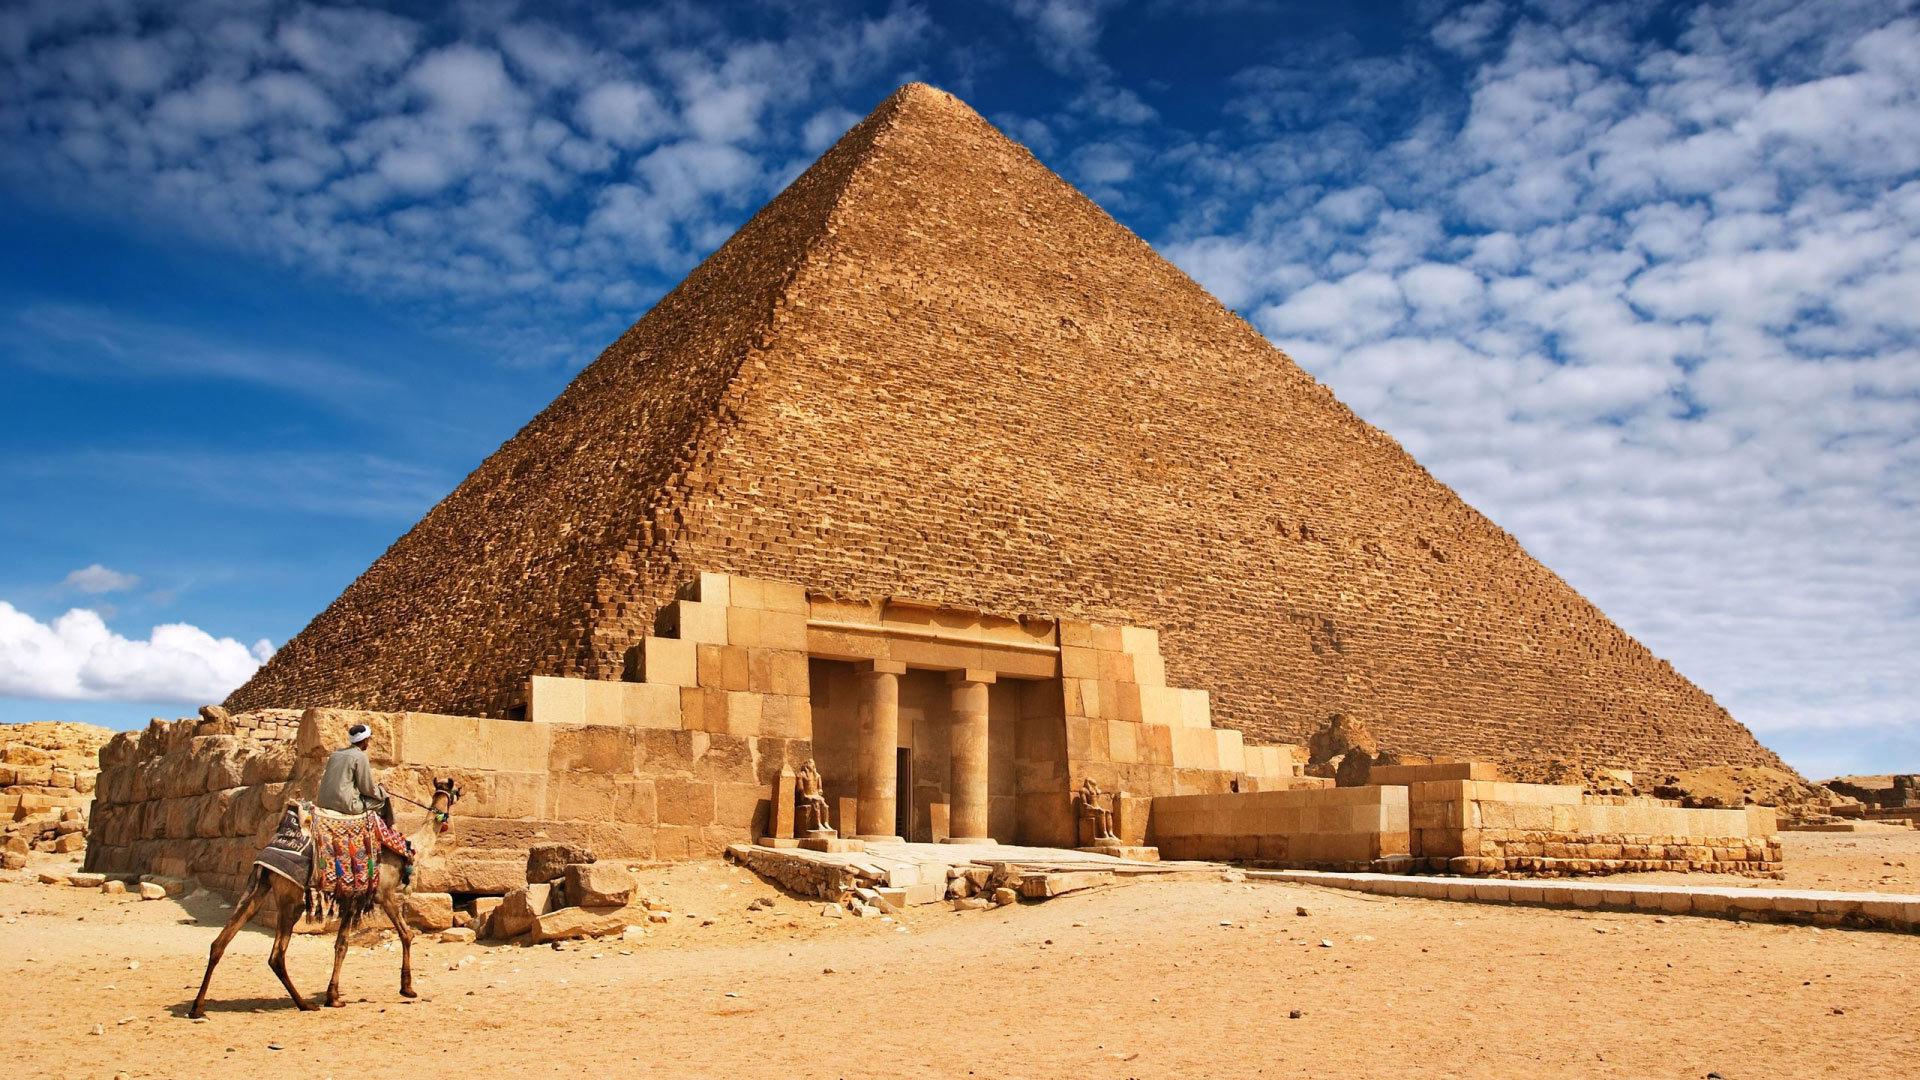 parthenon and pyramids